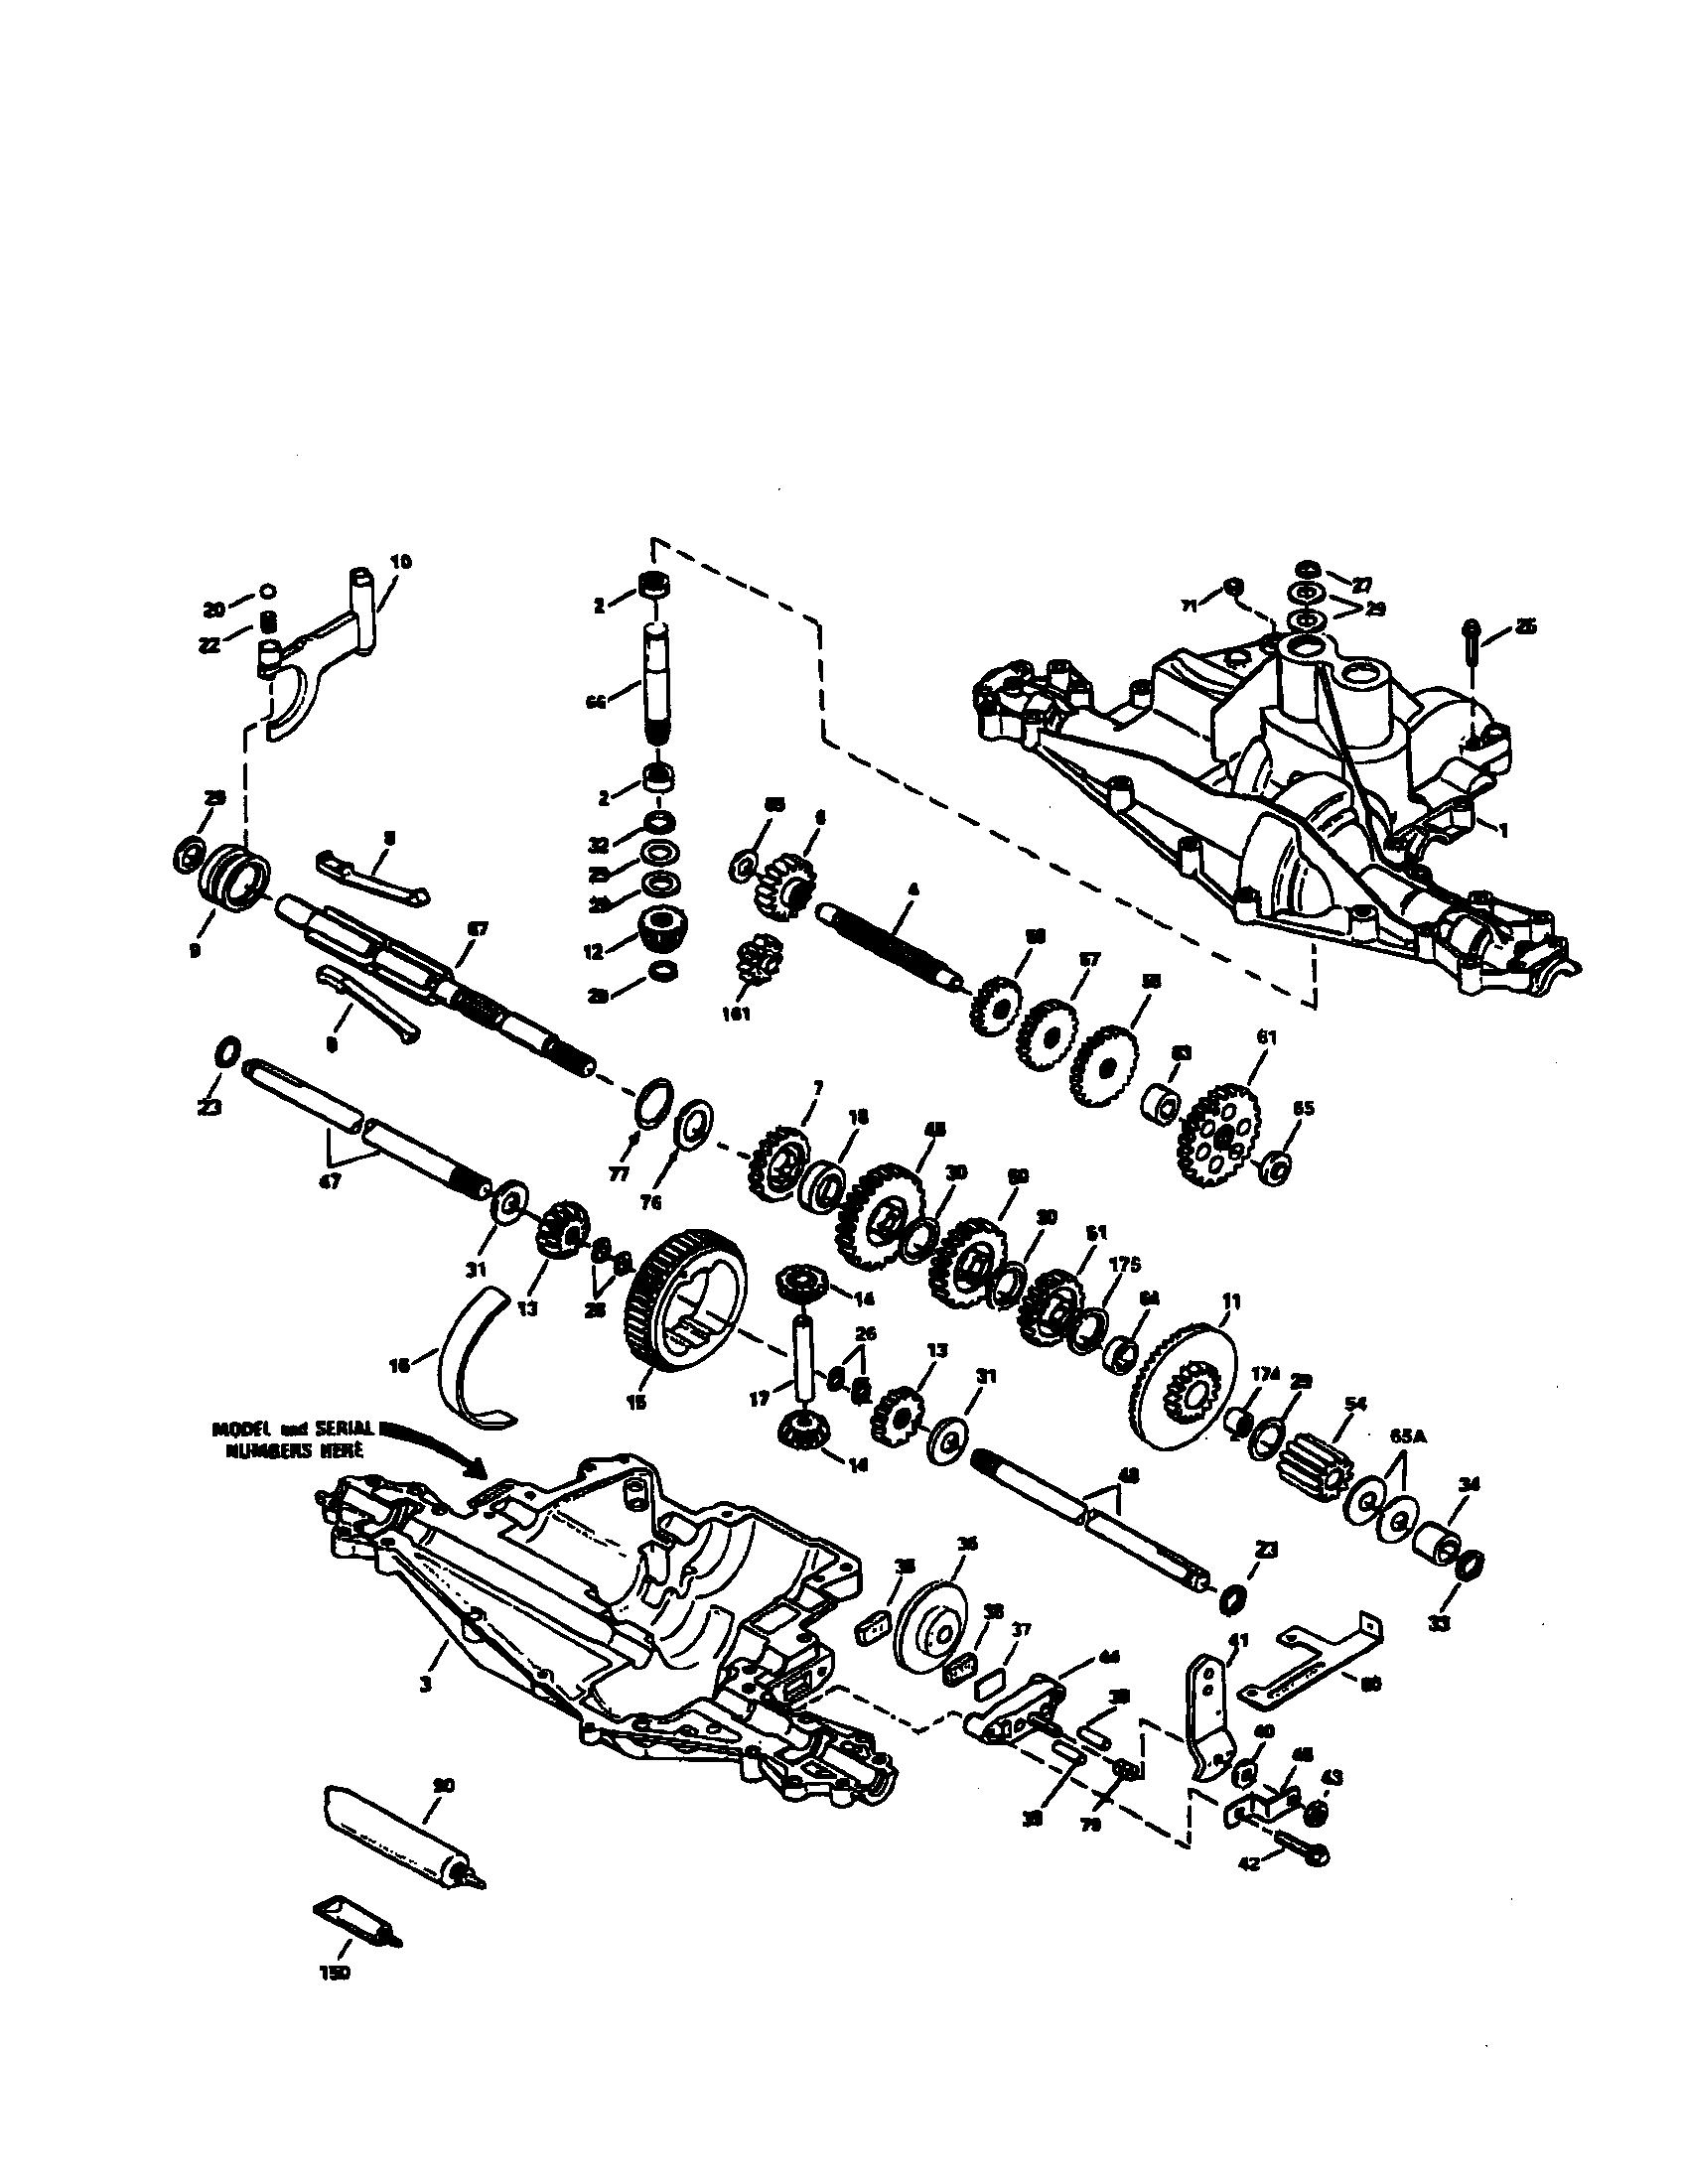 Craftsman Gt 48 Deck Belt Diagram